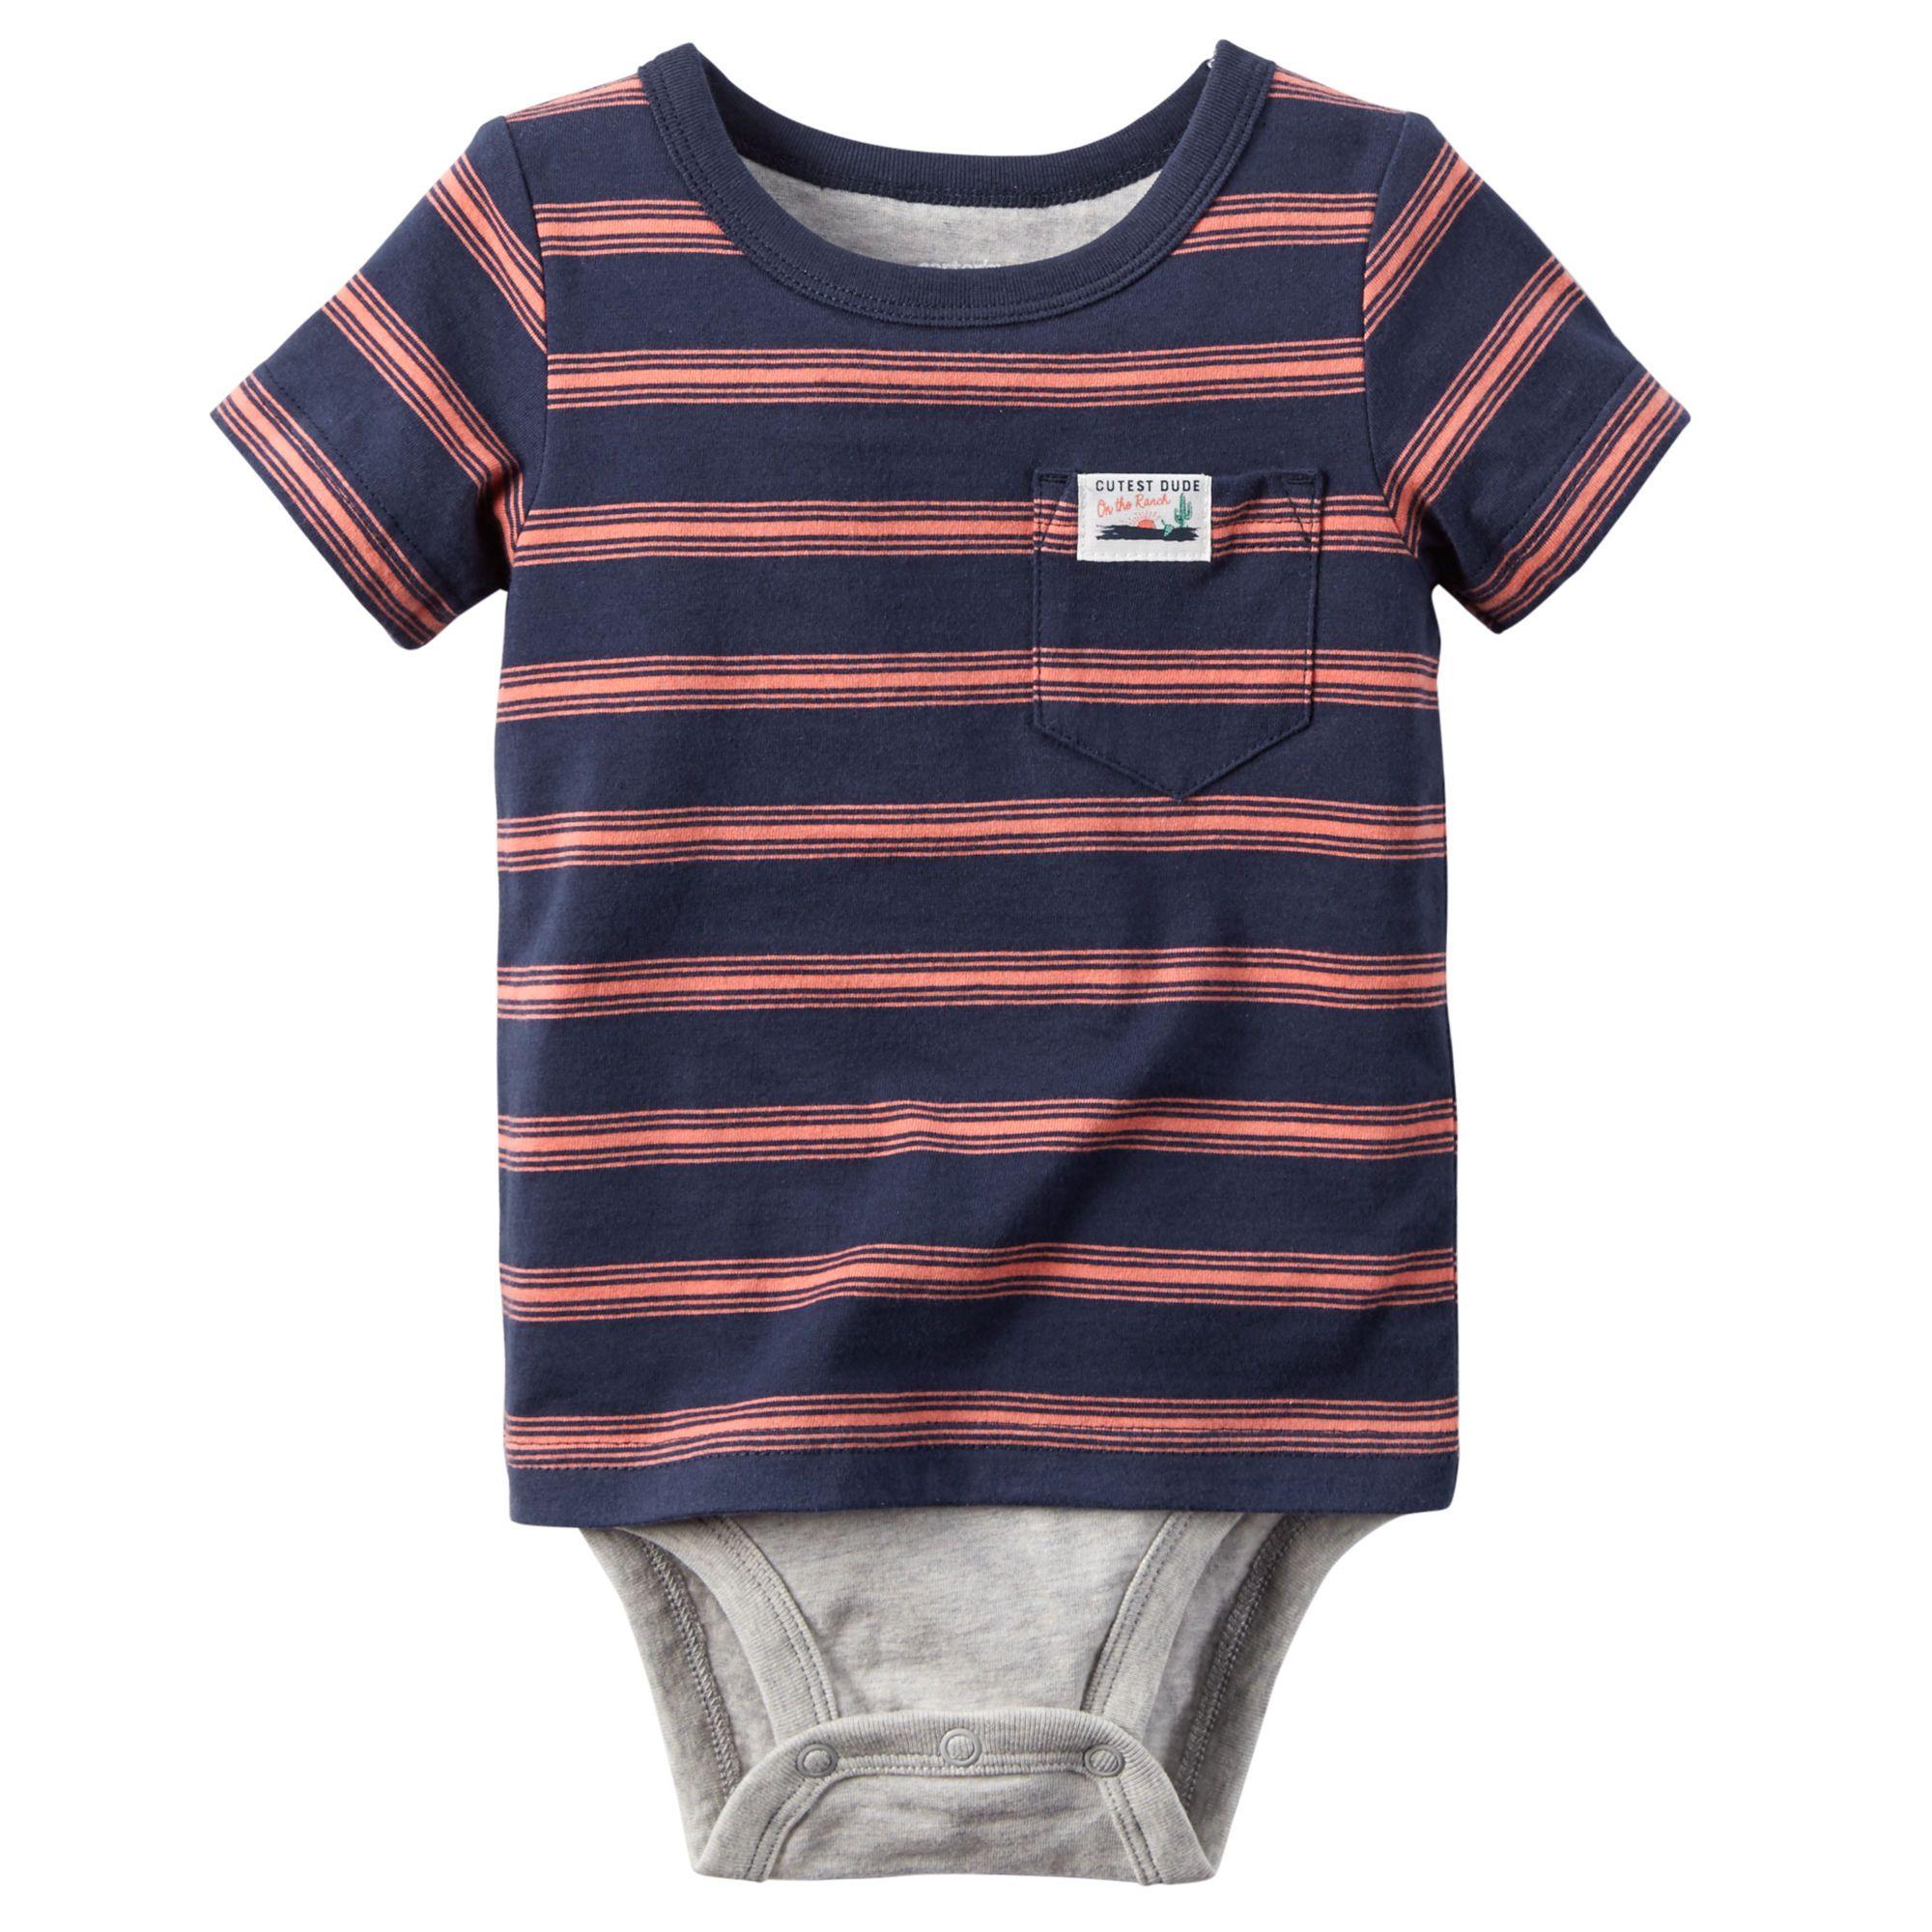 a69ad53a35a Baby Boy New Arrivals Clothes & Accessories | Carters.com | Baby Boy ...